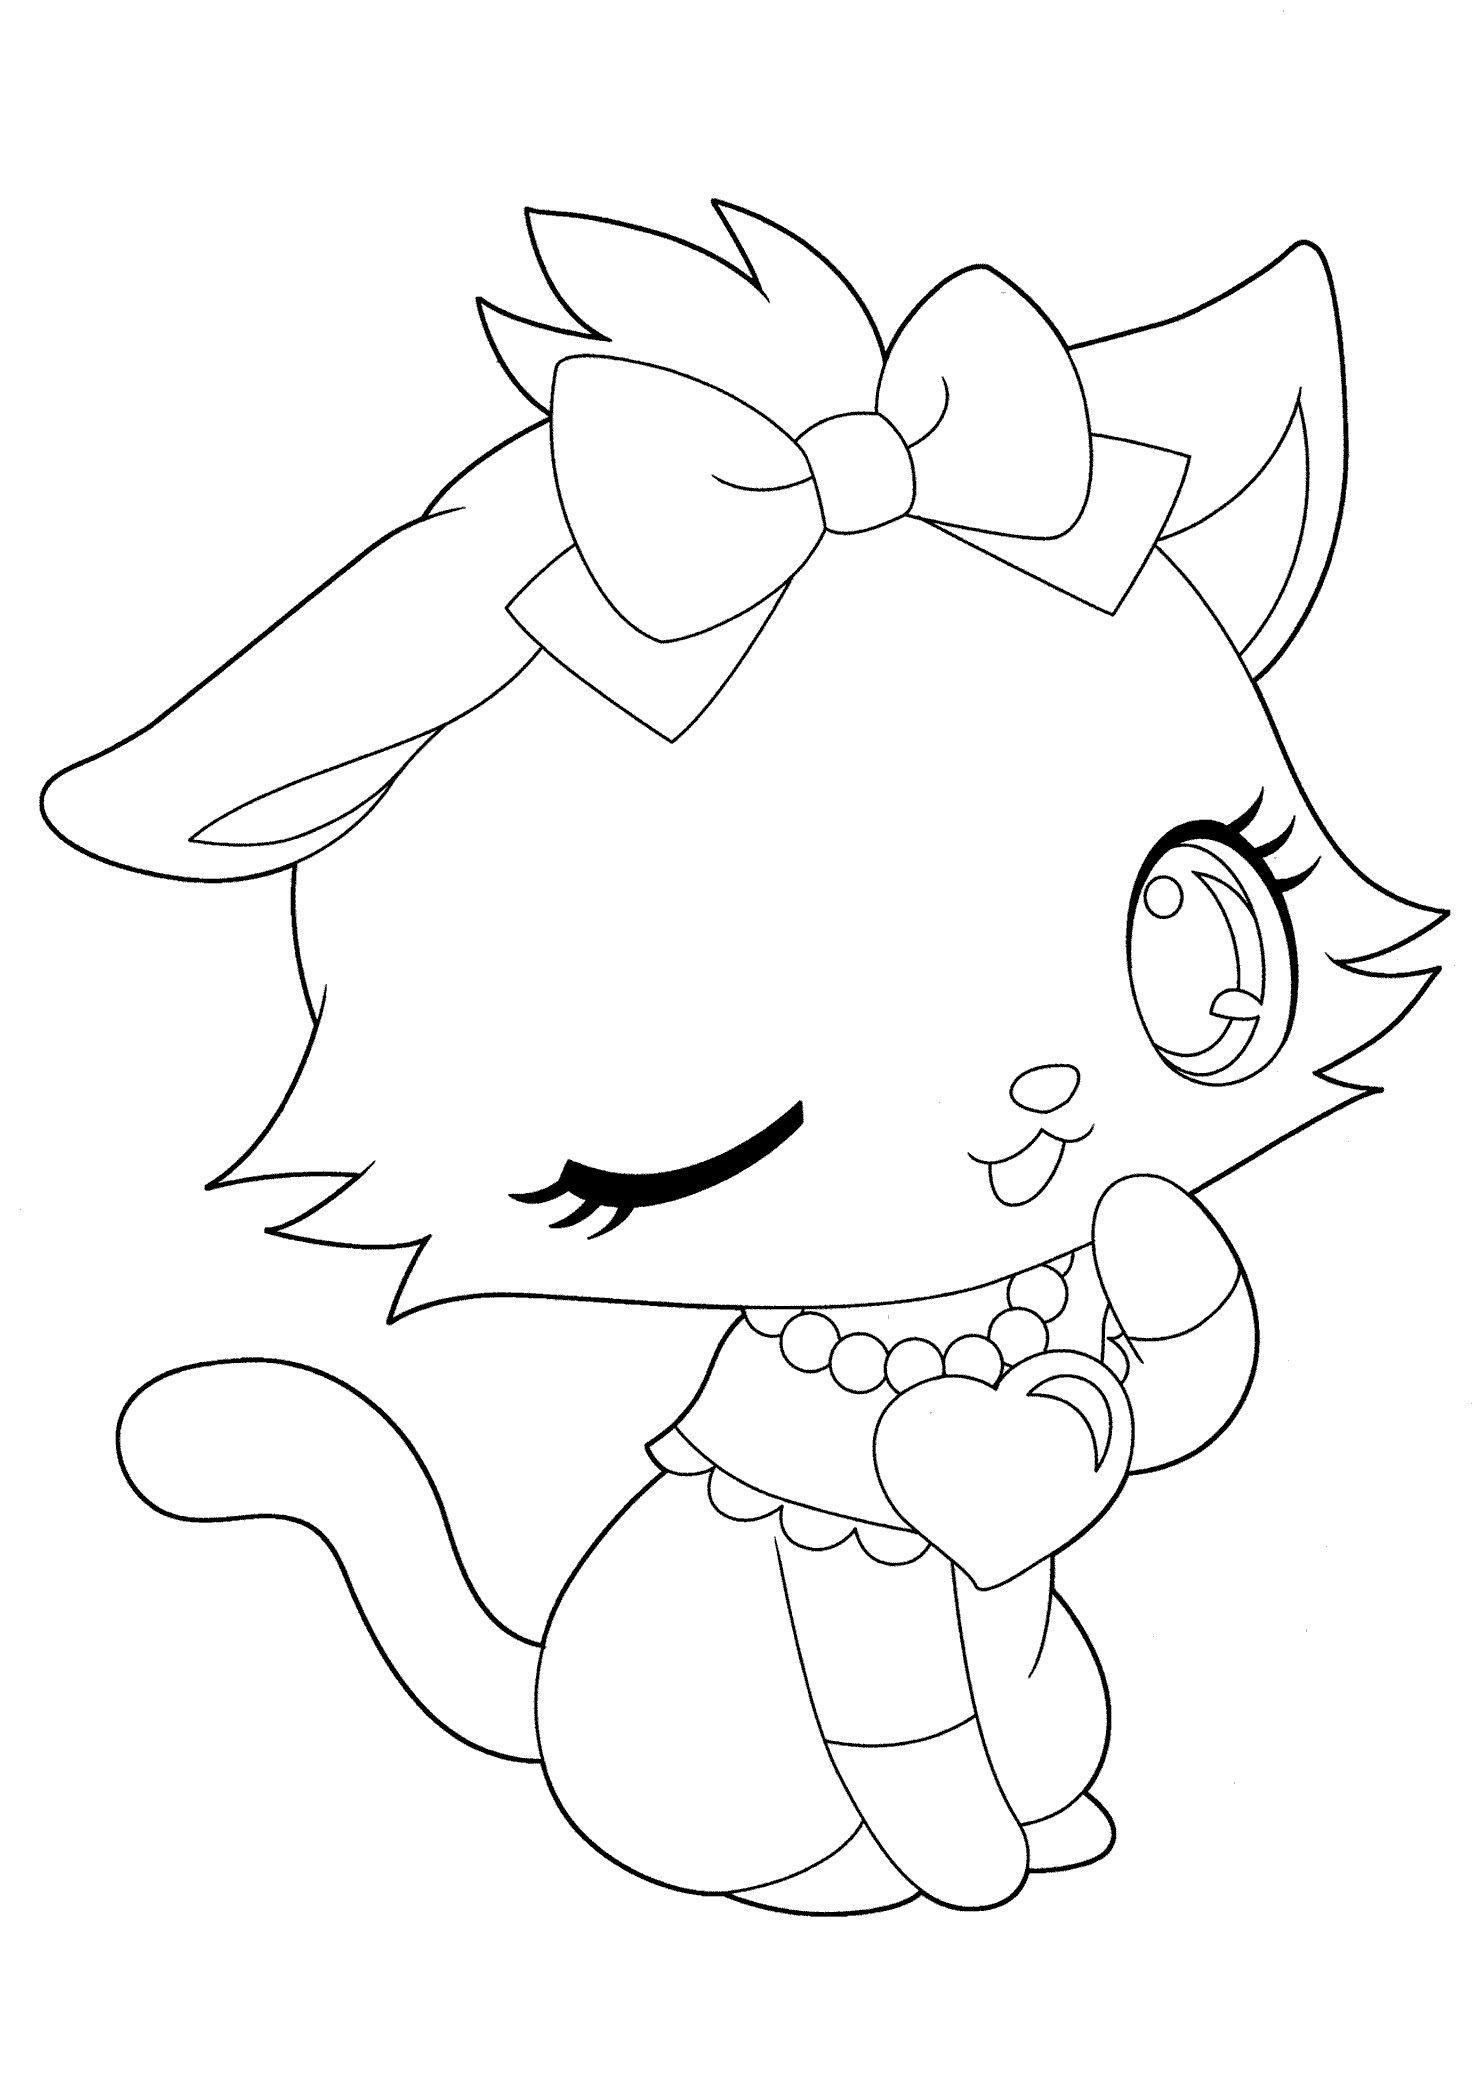 Unicorn Kitty Coloring Page Youngandtae Com Desenhos Da Hello Kitty Para Colorir Paginas Para Colorir Da Disney Paginas Para Colorir